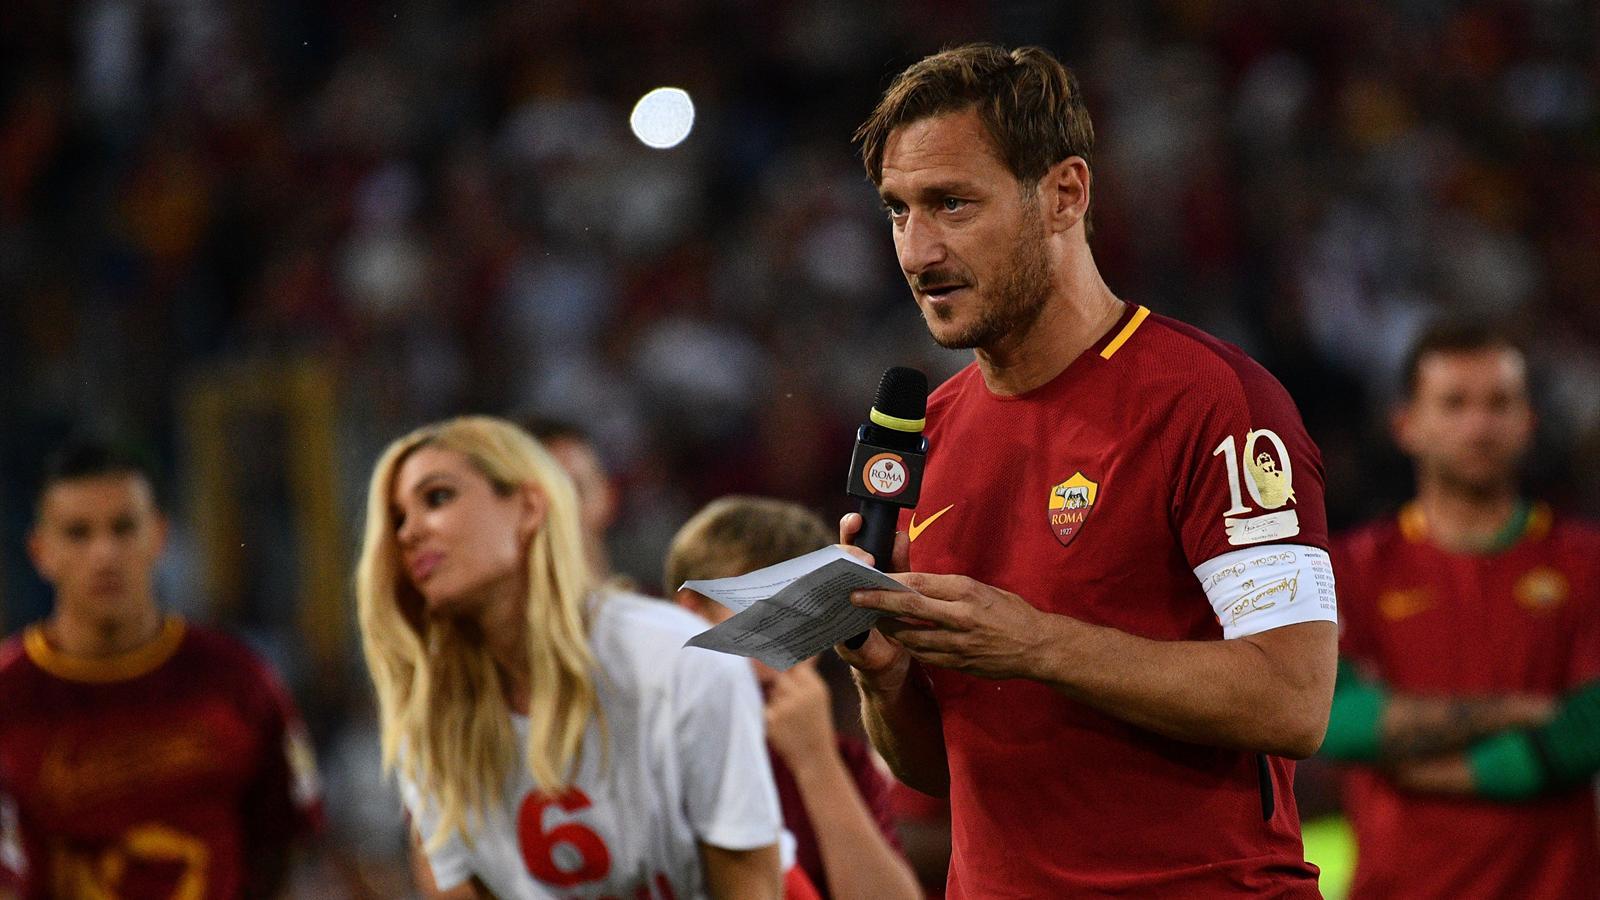 'I love you' - Francesco Totti bids an emotional farewell to Roma fans - Serie A 2016-2017 ...